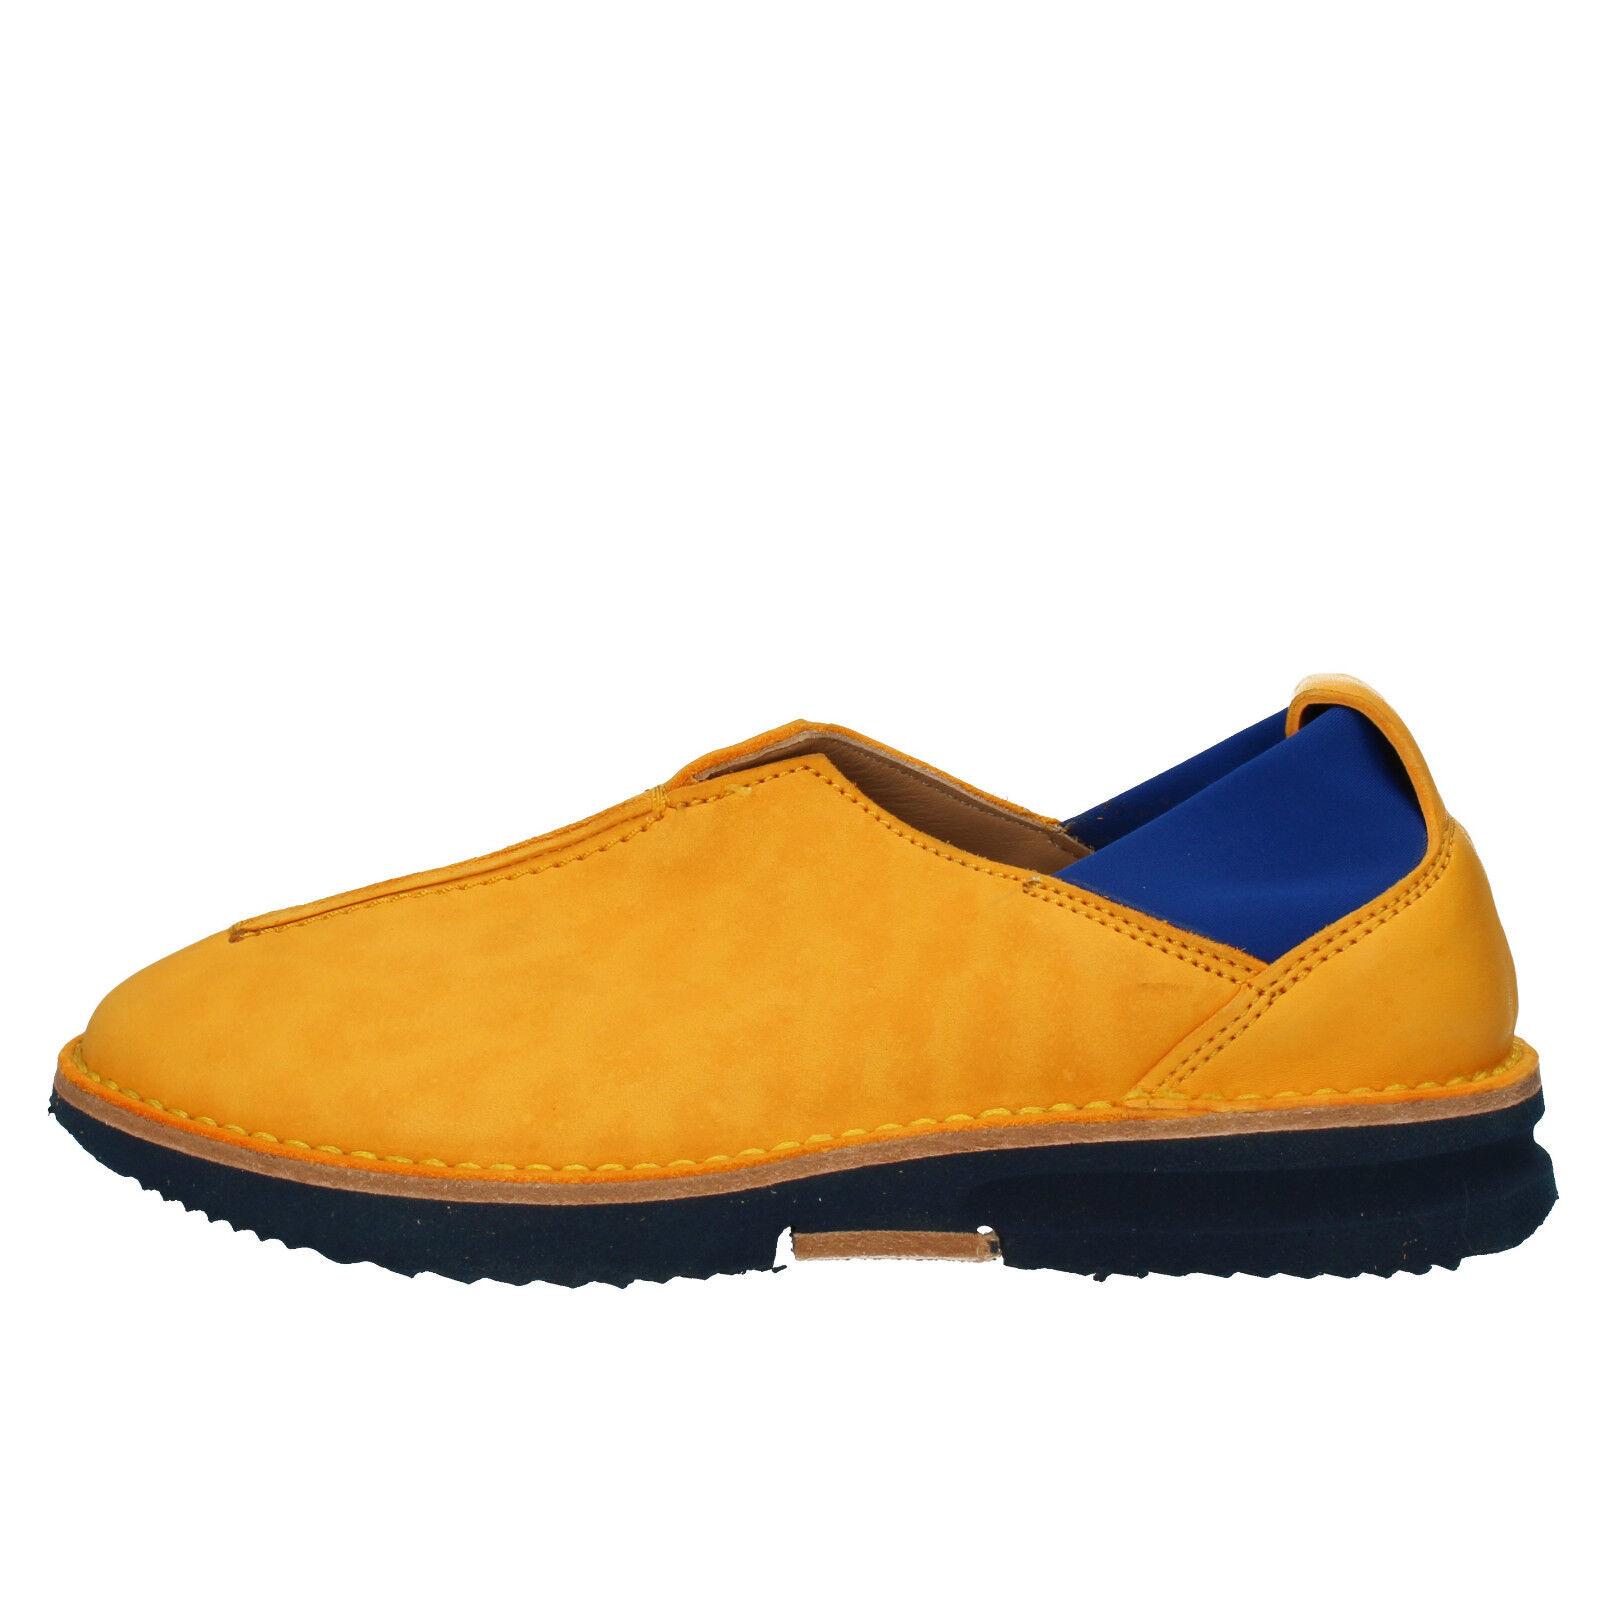 Damen schuhe MOMA 37 EU Turnschuhe gelb blau leder AD162